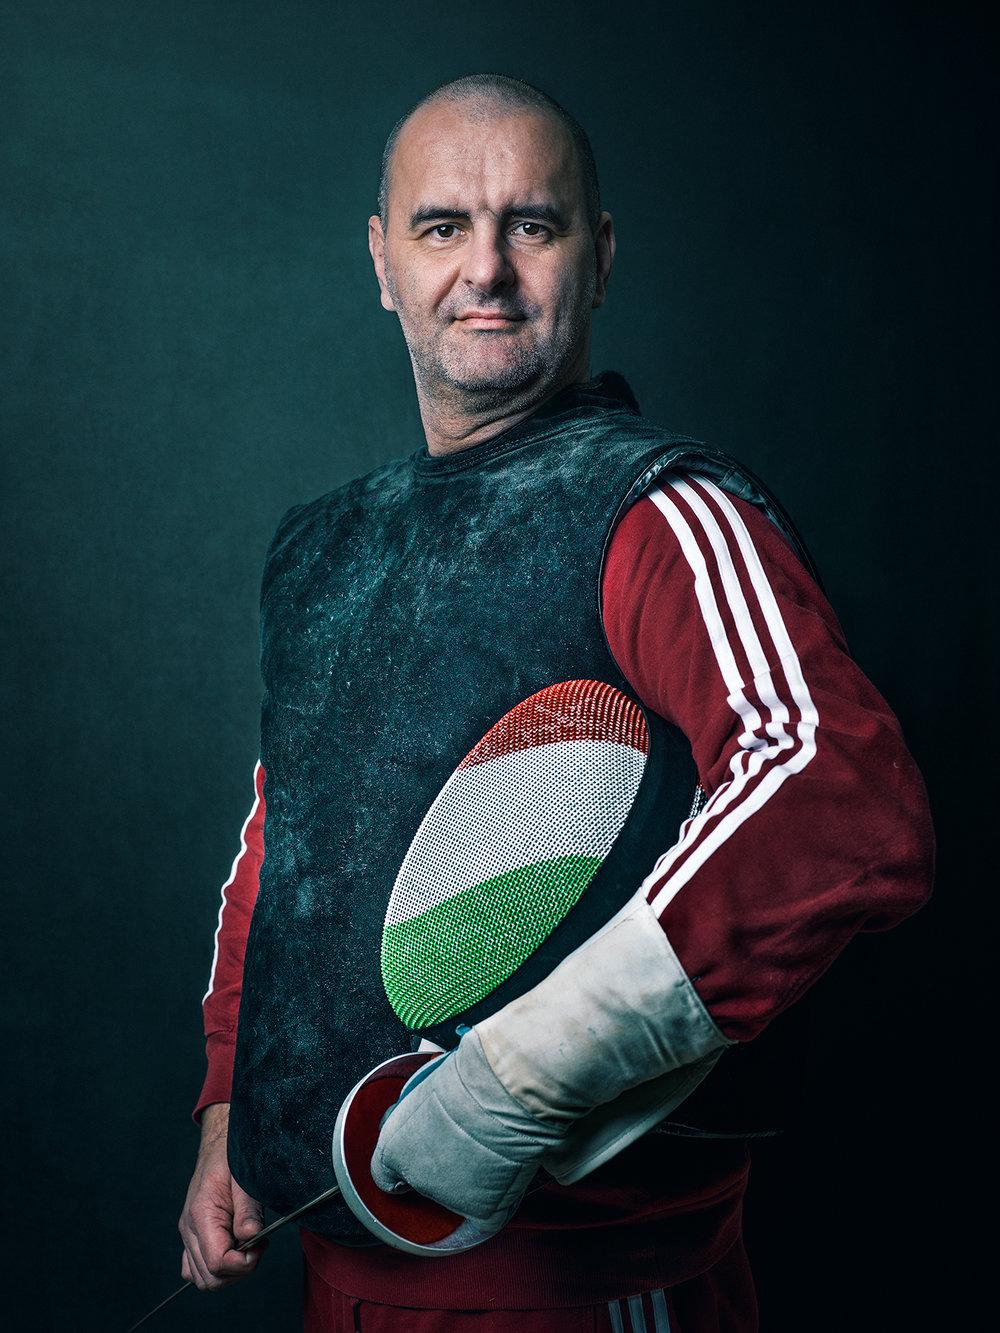 Oscar-arribas-esgrima-maestro-fencing-master-fencer-fechten-scherma-escrime-portrait-fotografo-retrato-photographer013.jpg